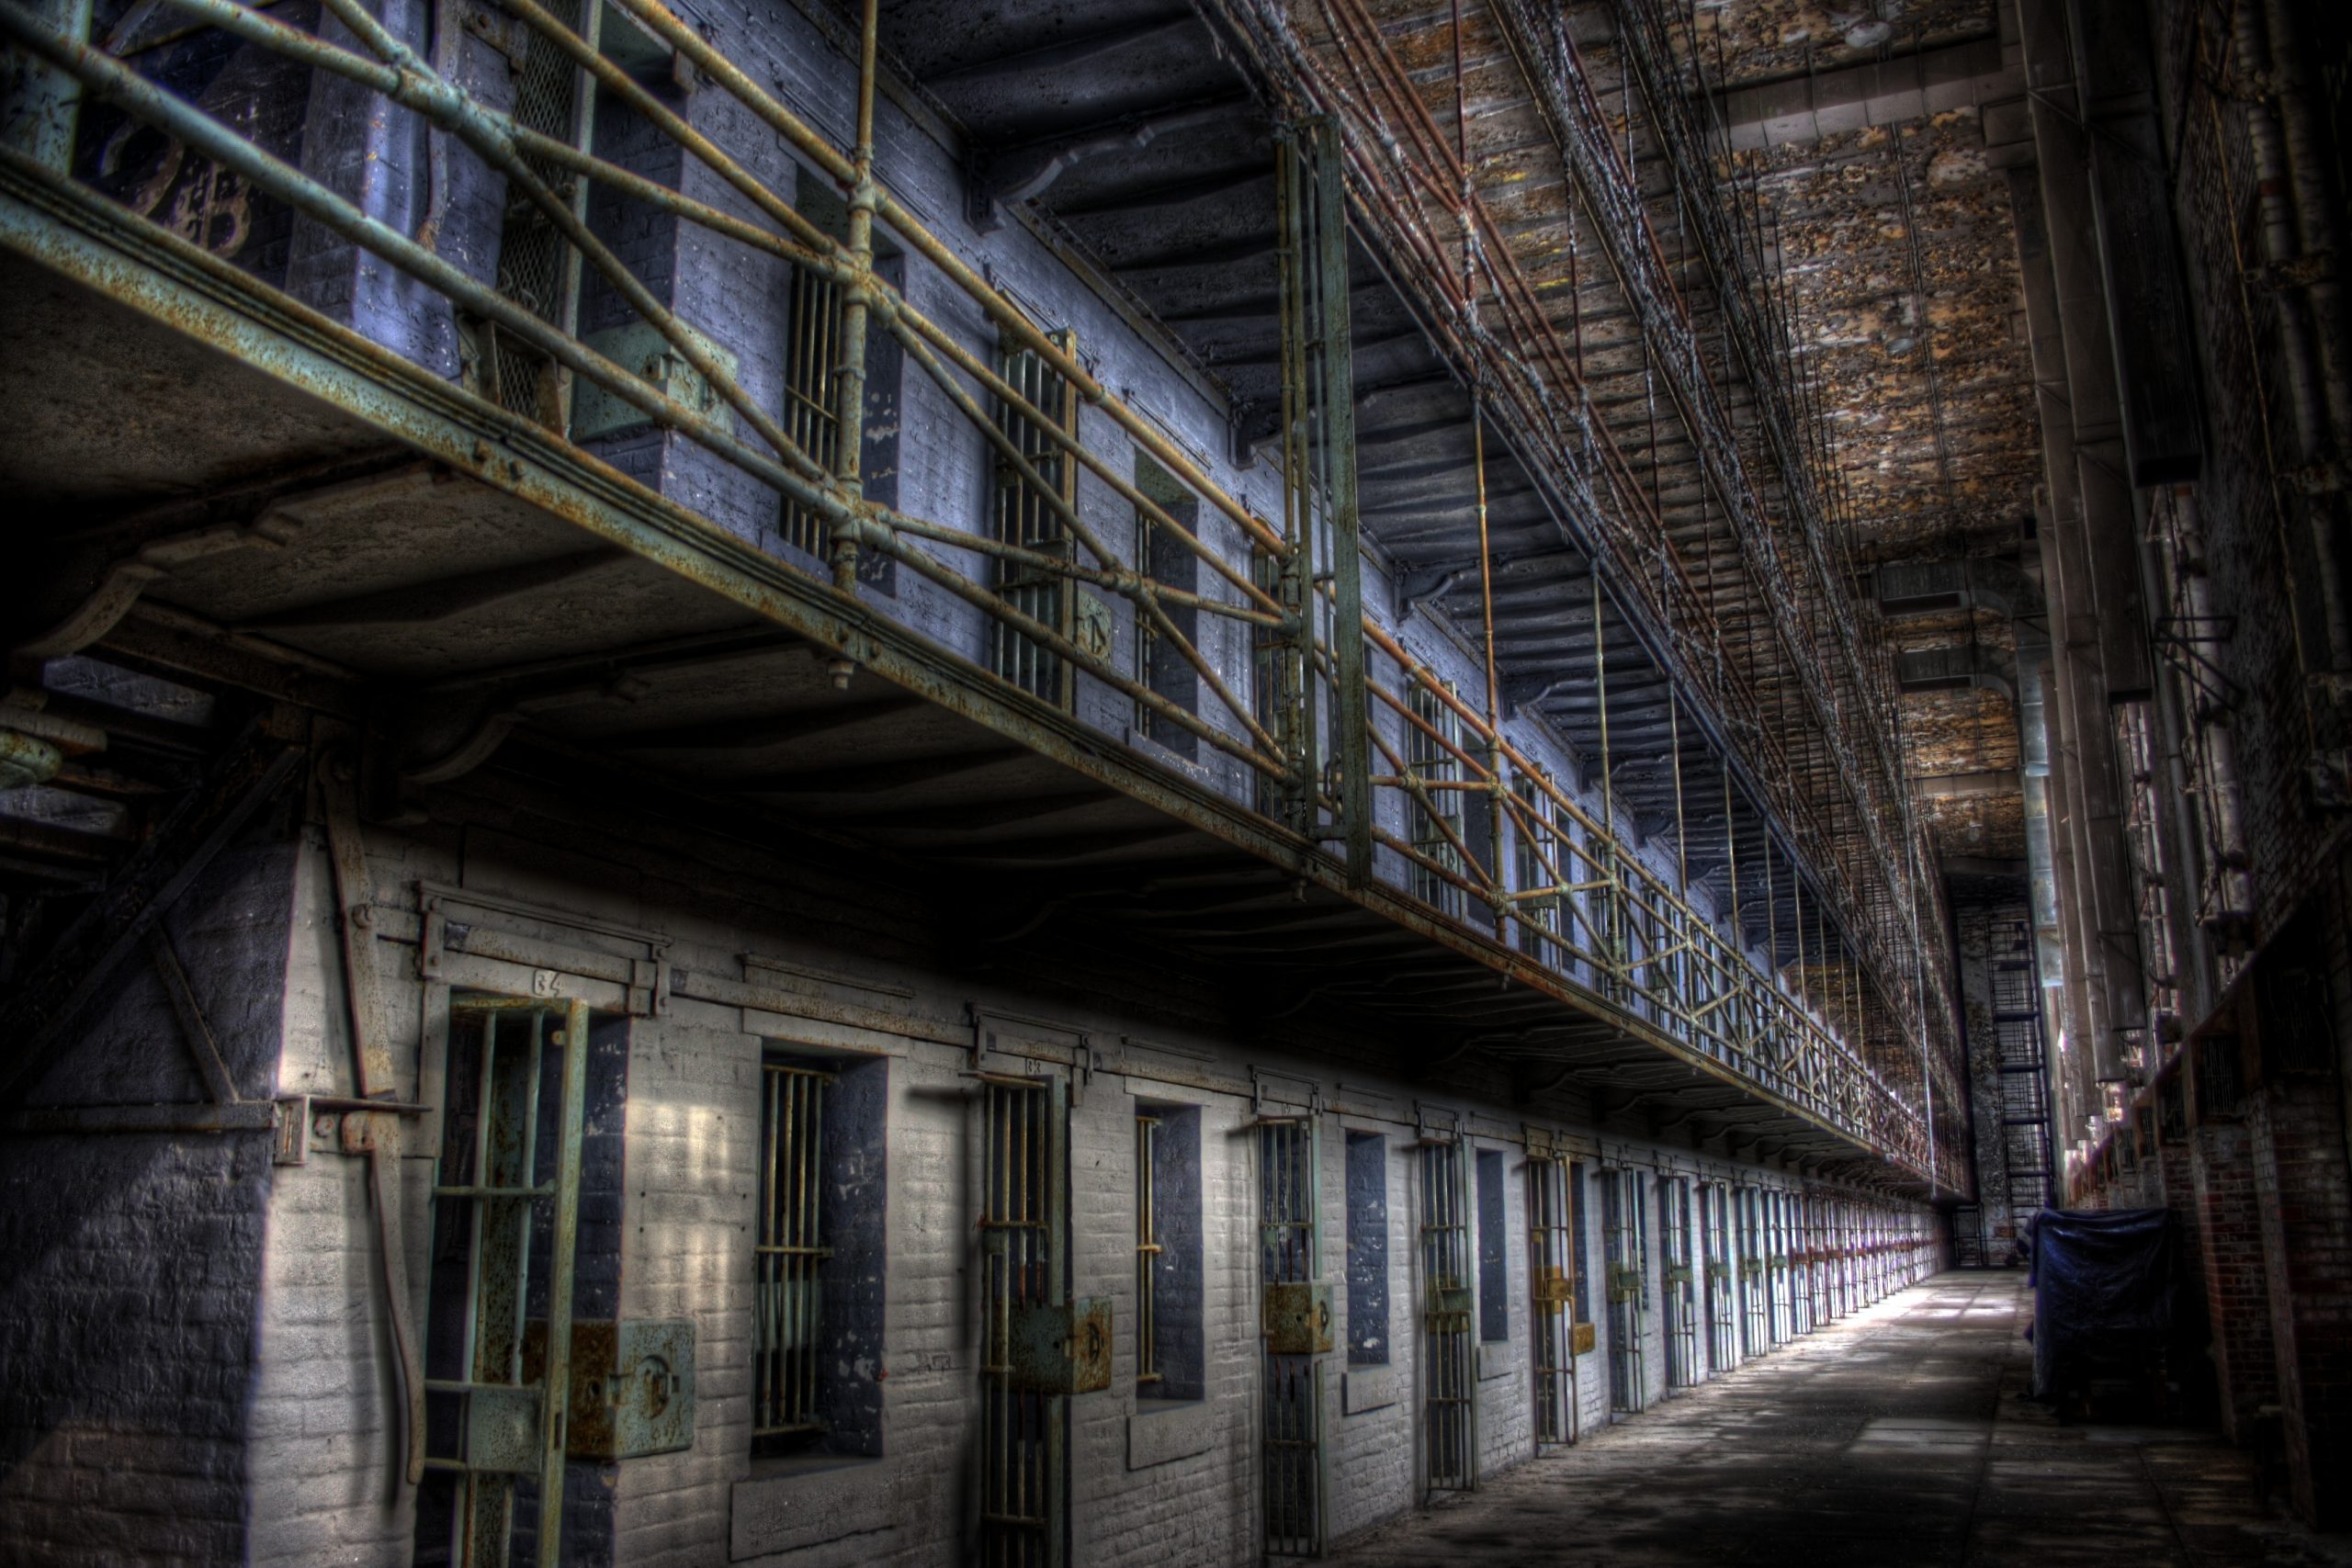 historic_ohio_state_reformatory_cell_blocks